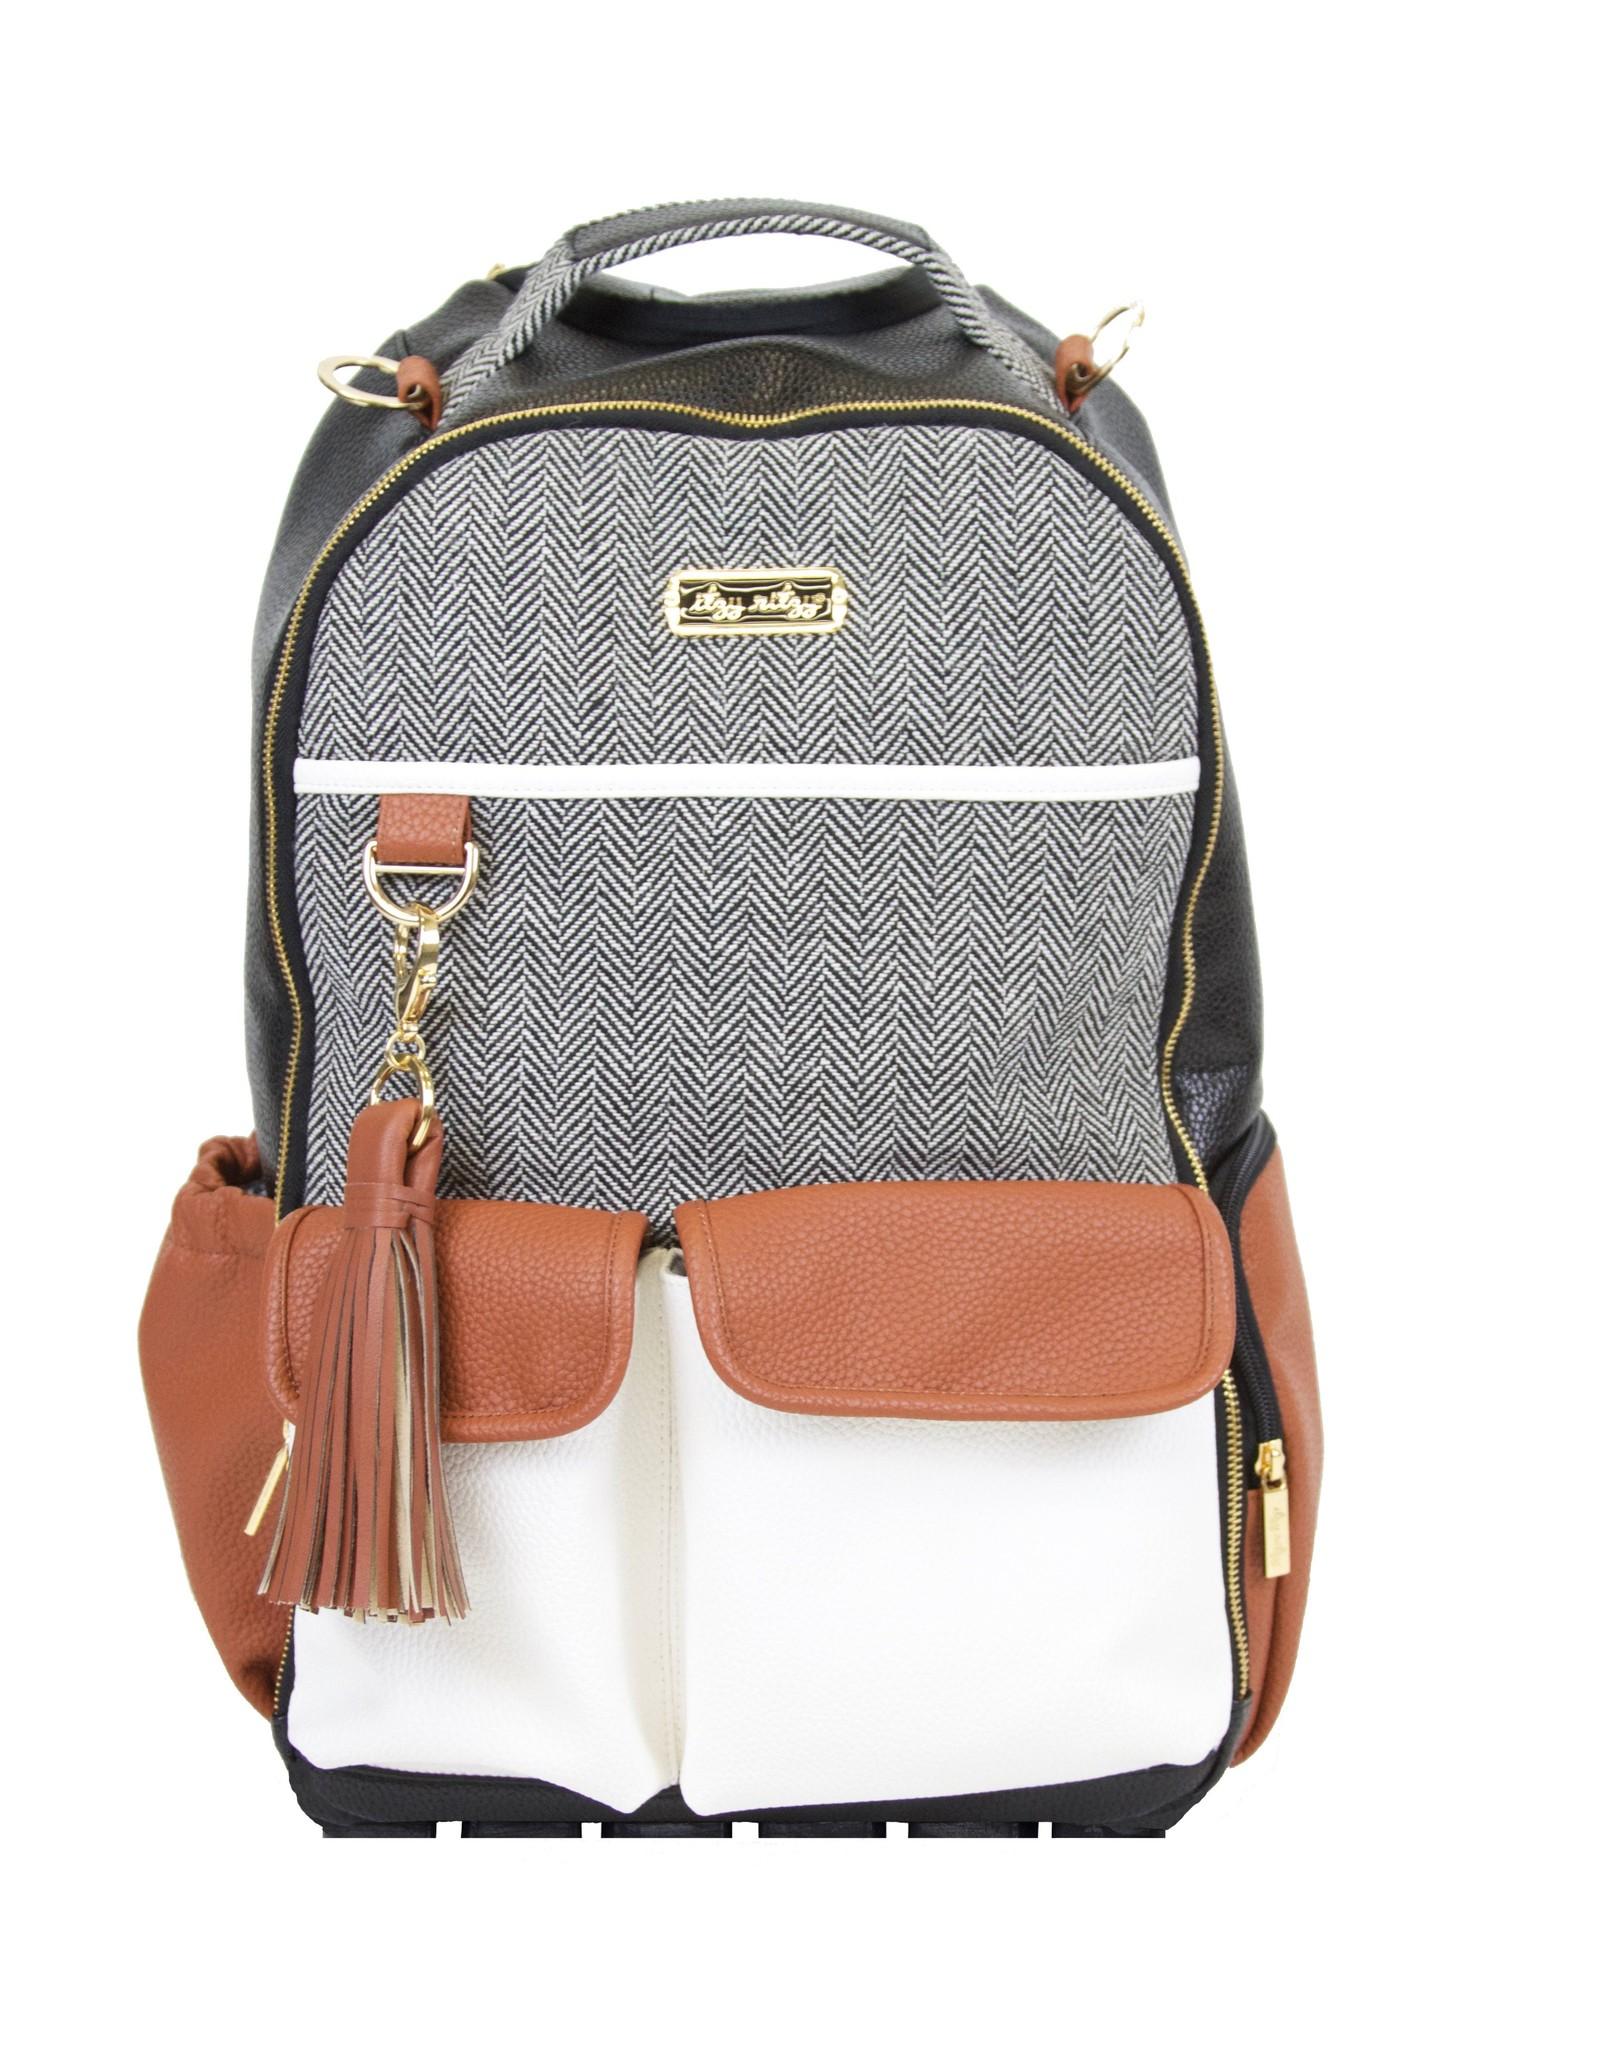 Itzy Ritzy Coffee & Cream Boss Backpack Diaper Bag